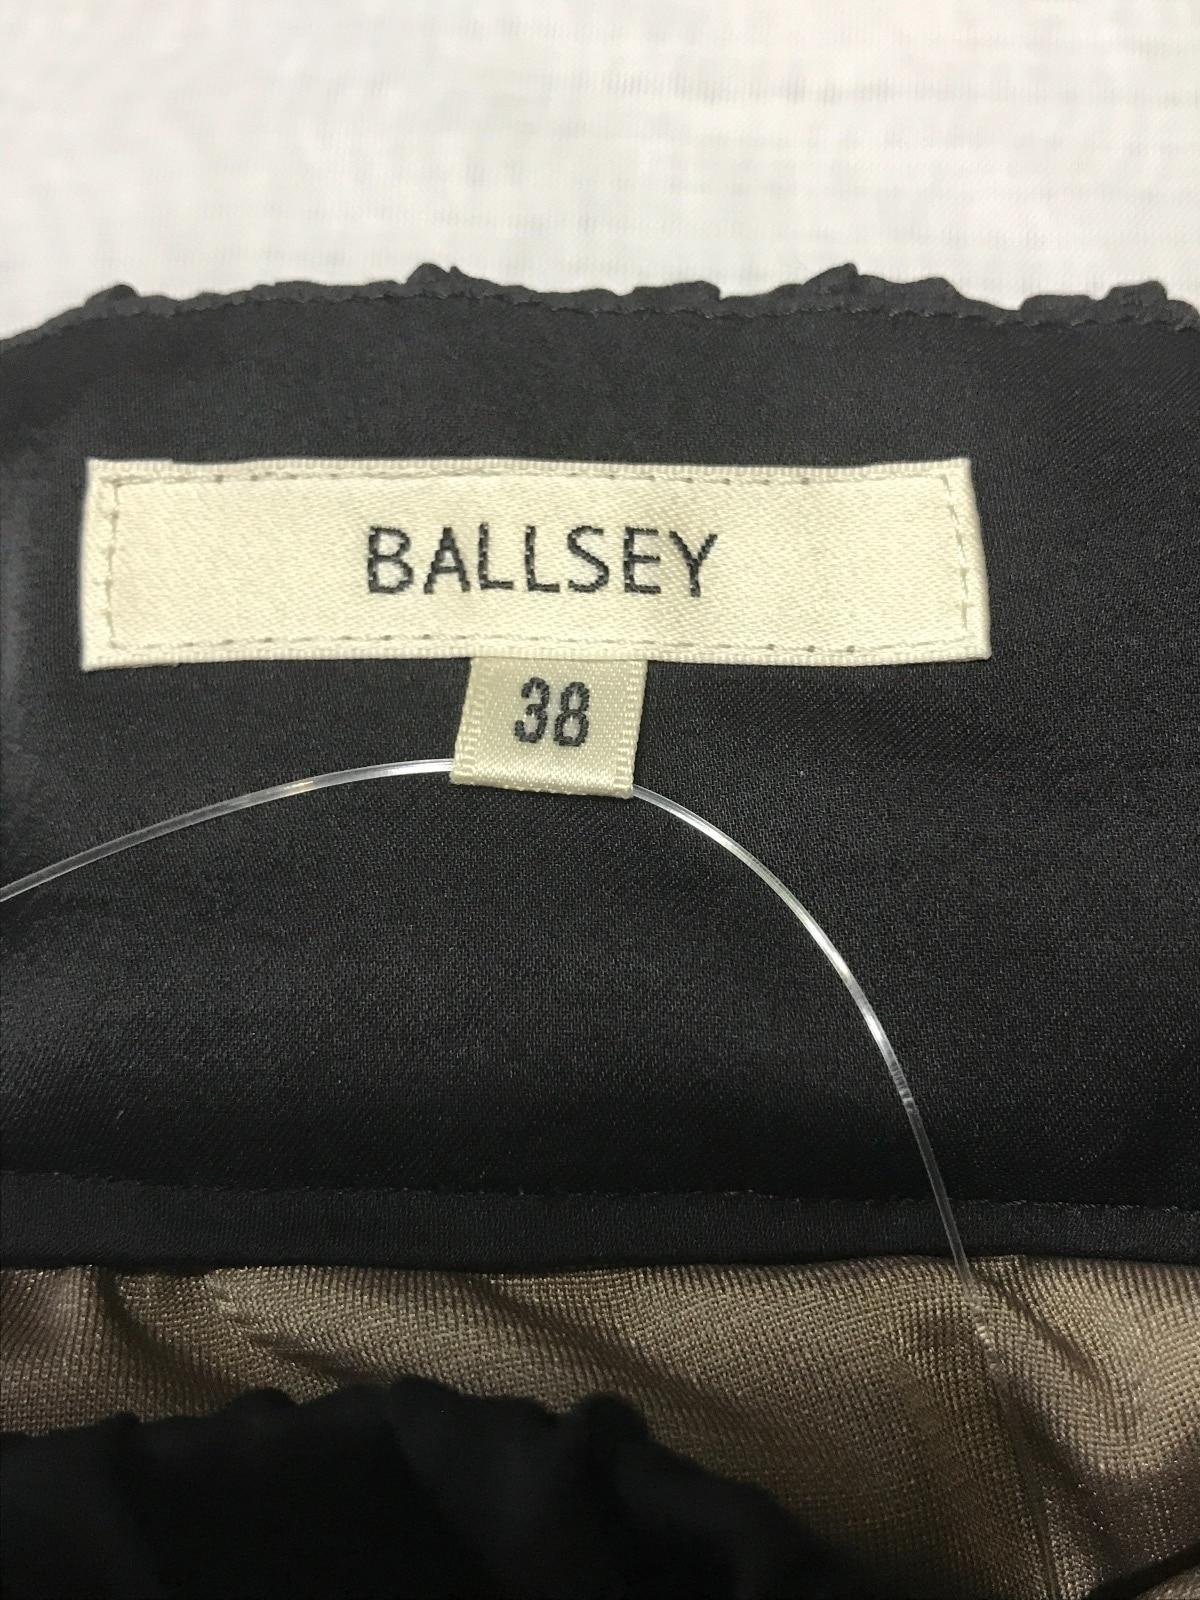 BALLSEY(ボールジー)のスカート